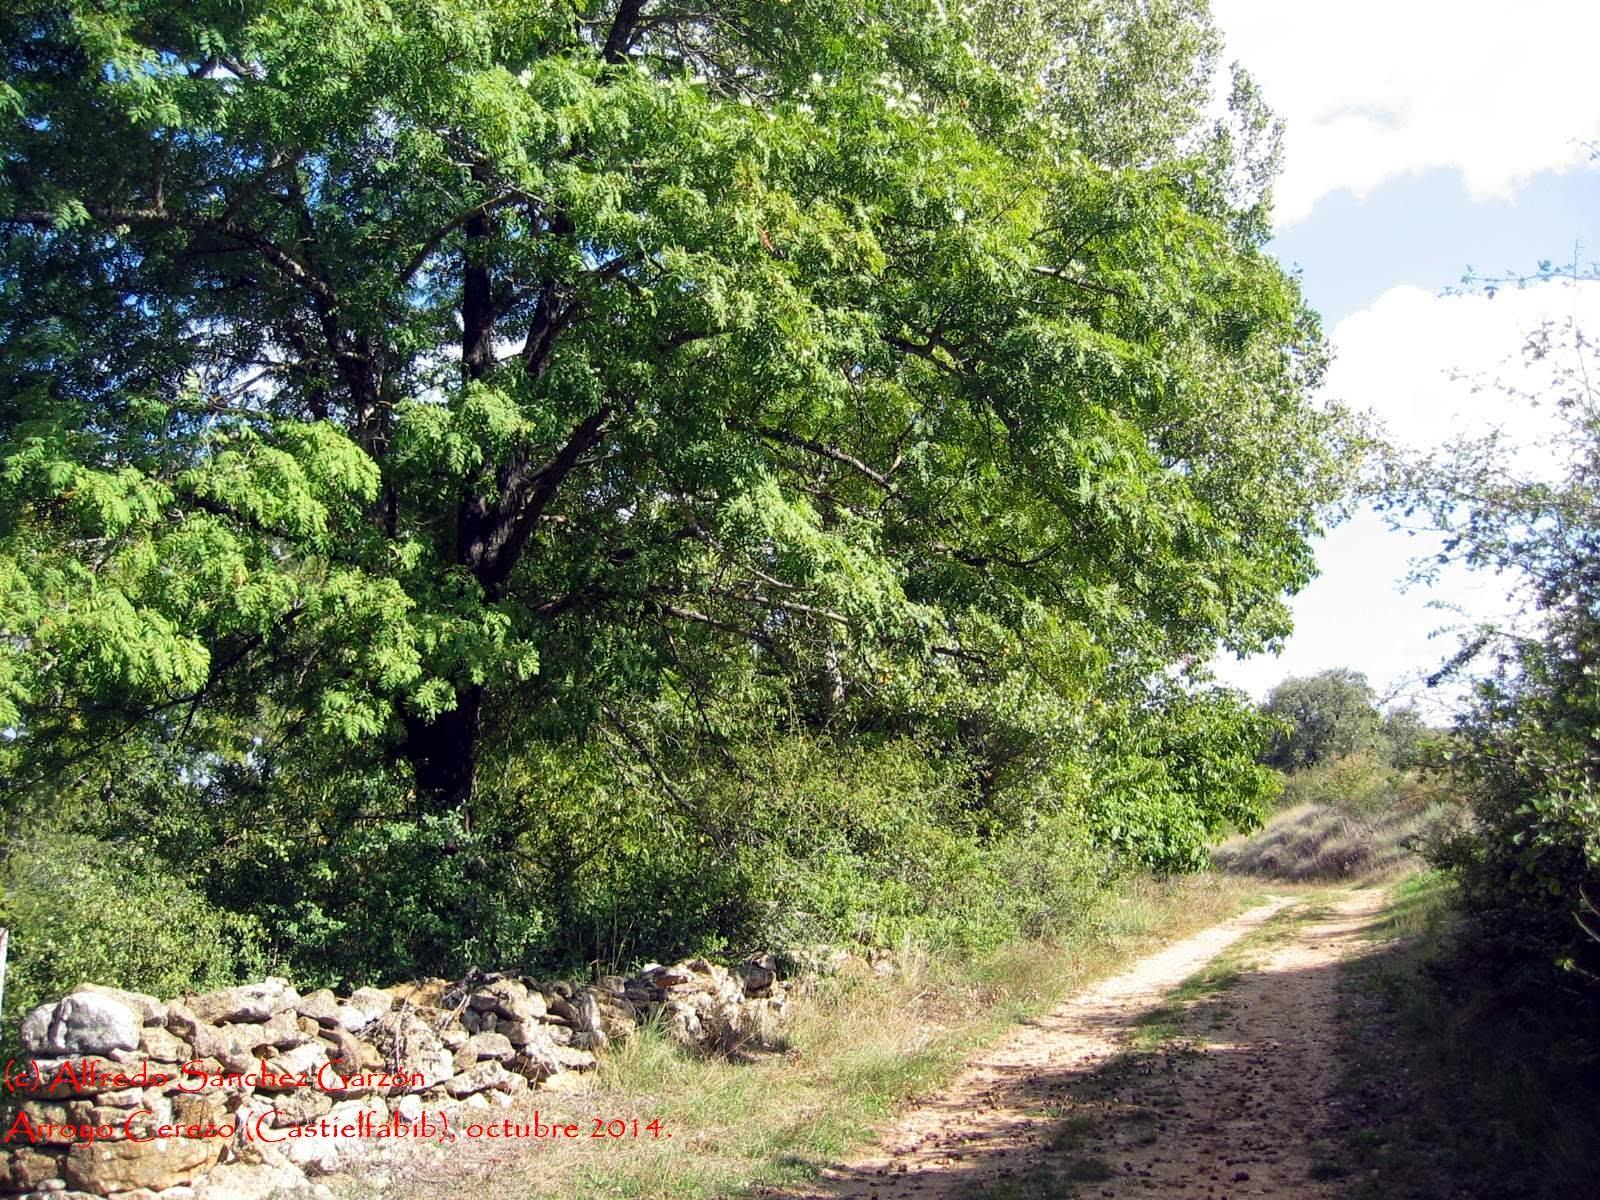 Castielfabib-arroyo-cerezo-serbal-comun